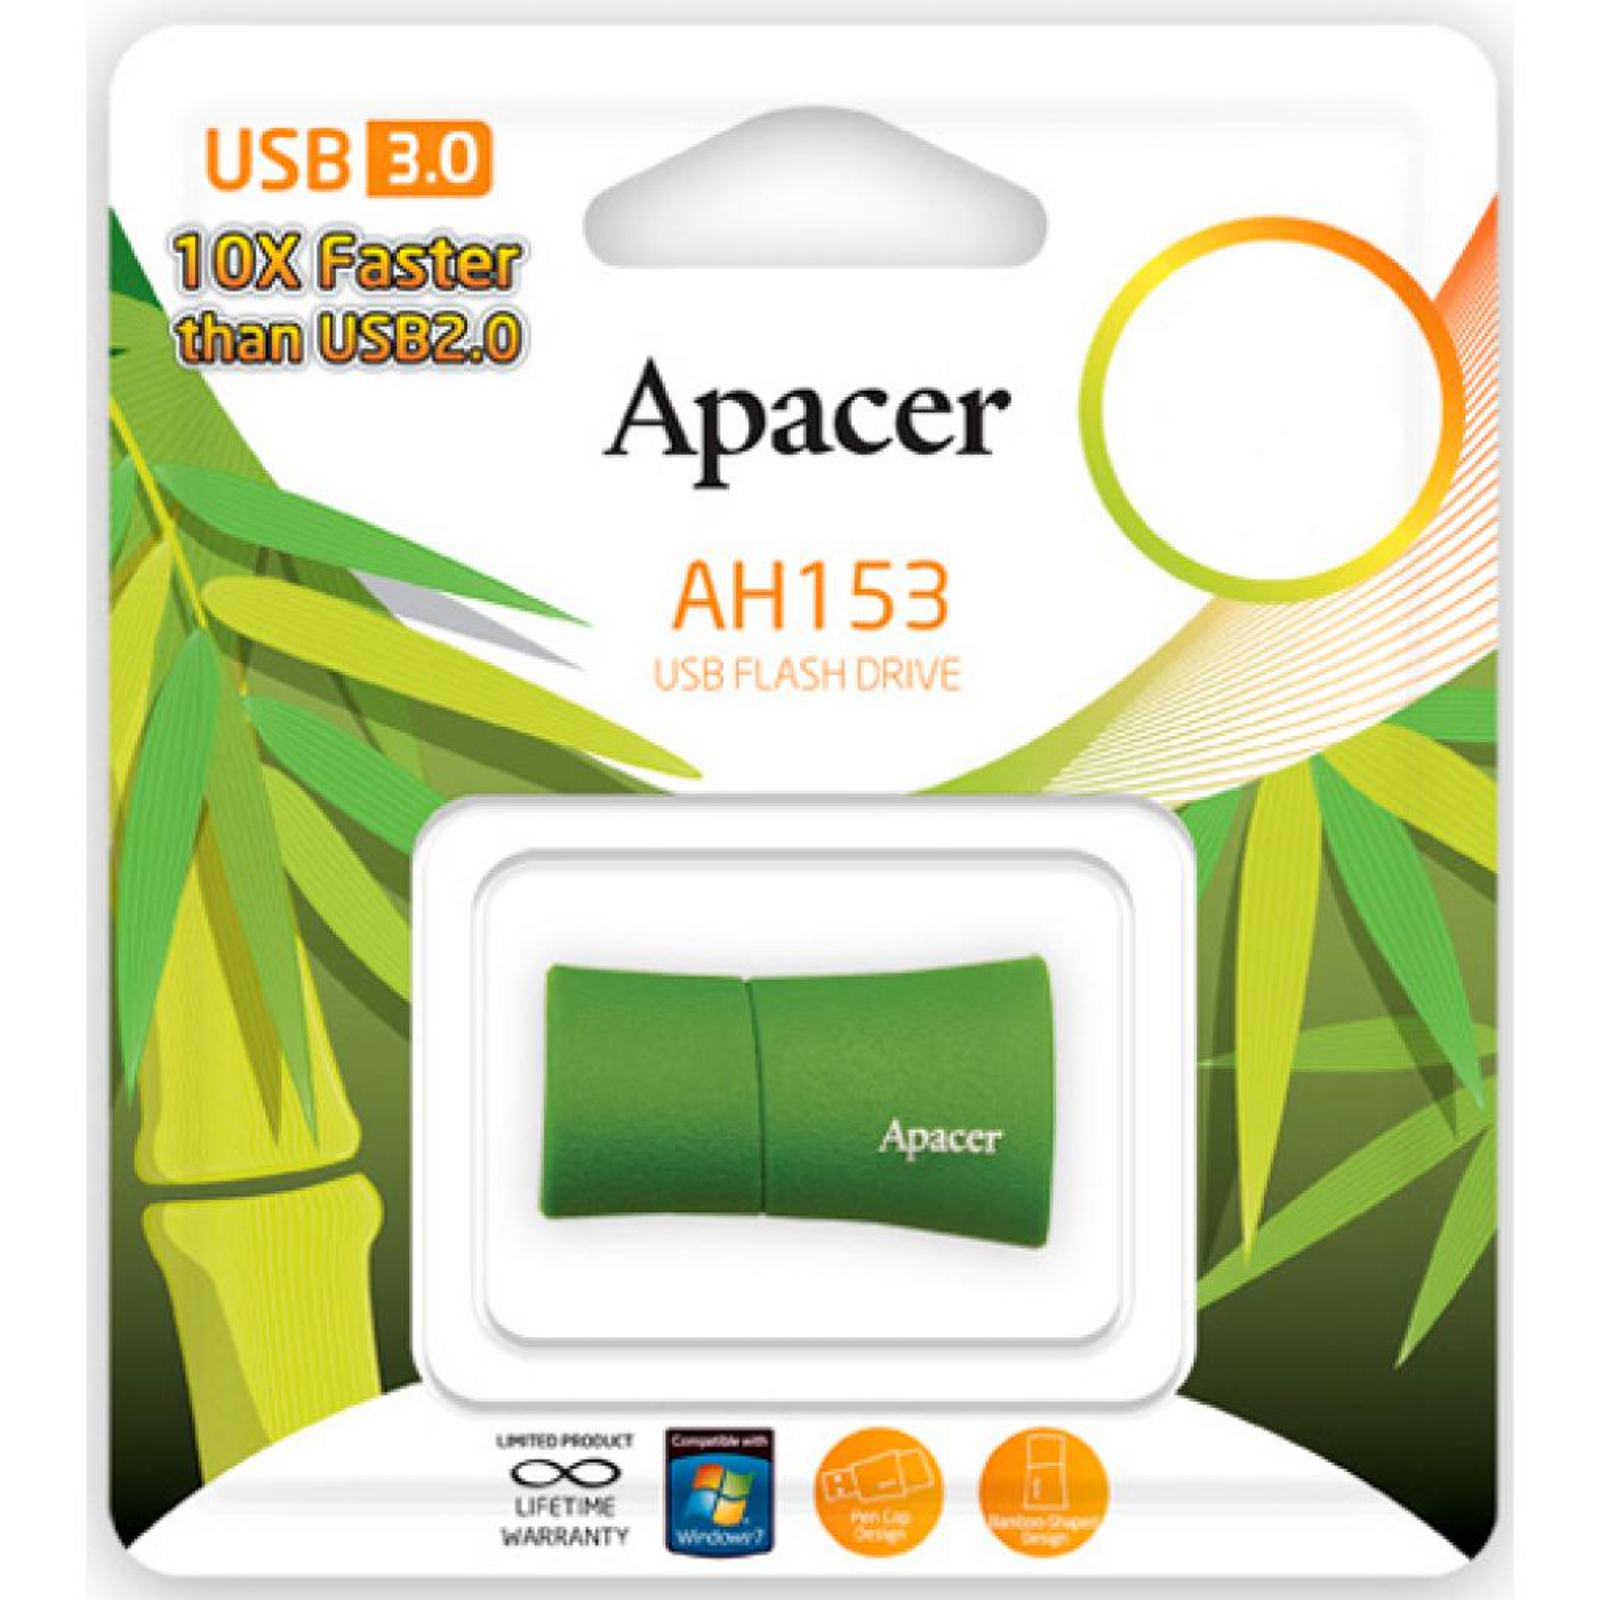 USB флеш накопитель 32GB AH153 Green RP USB3.0 Apacer (AP32GAH153G-1) изображение 5